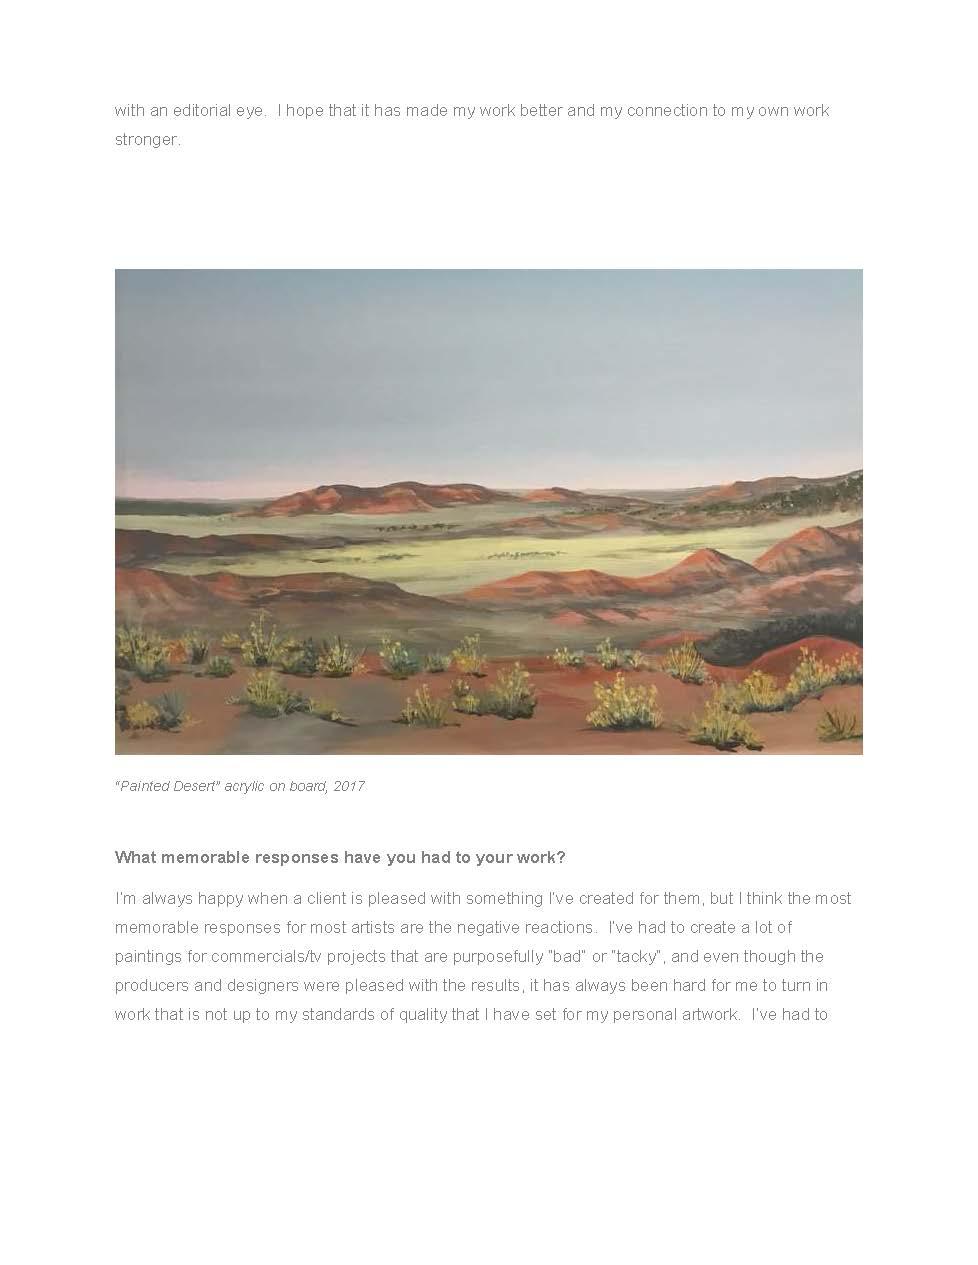 Painting - Painted Desert